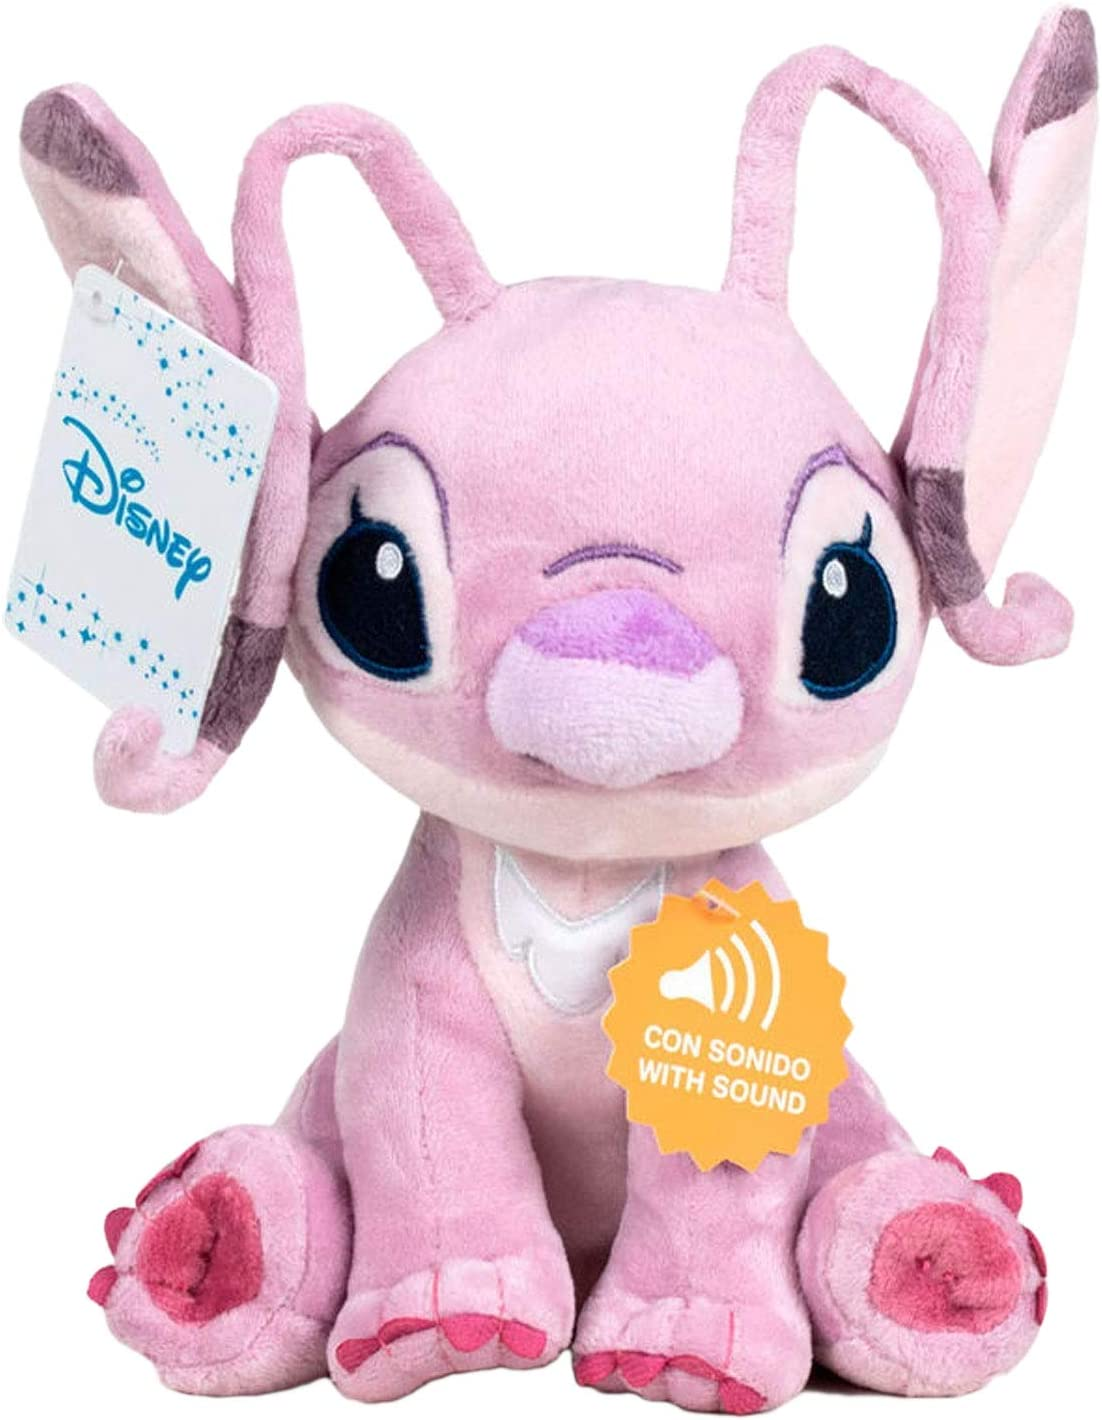 Lilo & Stitch - Peluche 11'41